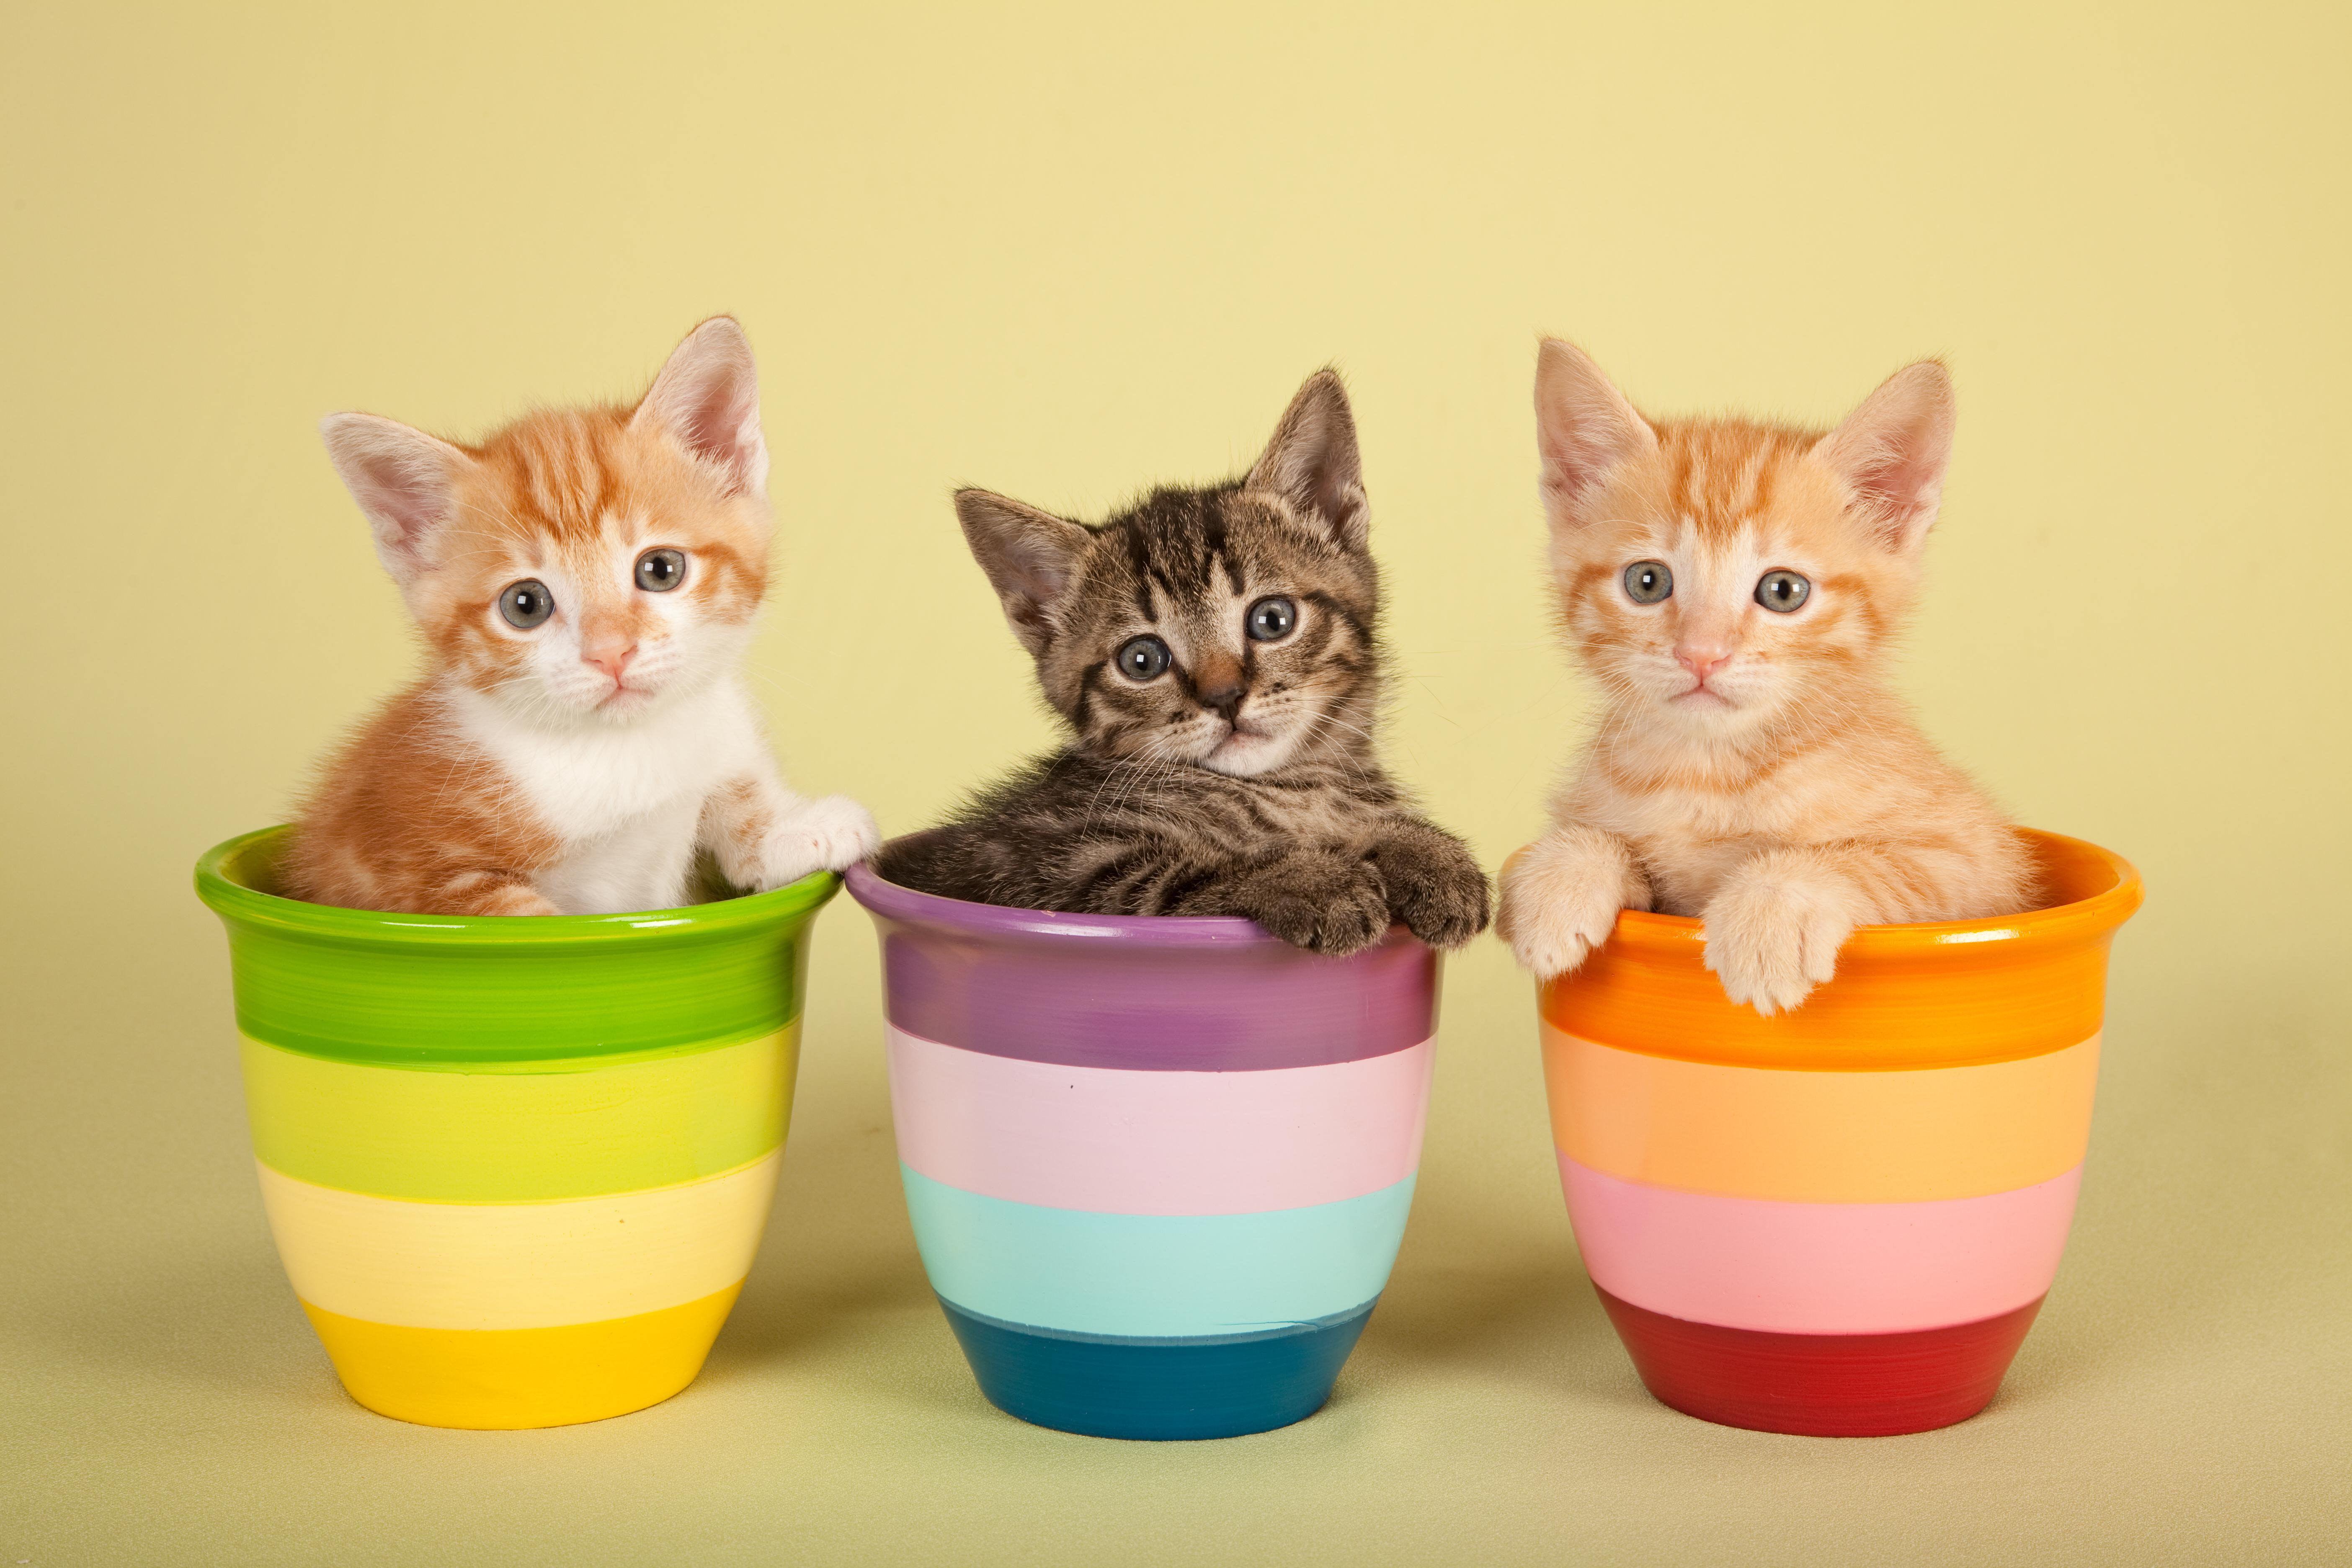 1-CuteCats